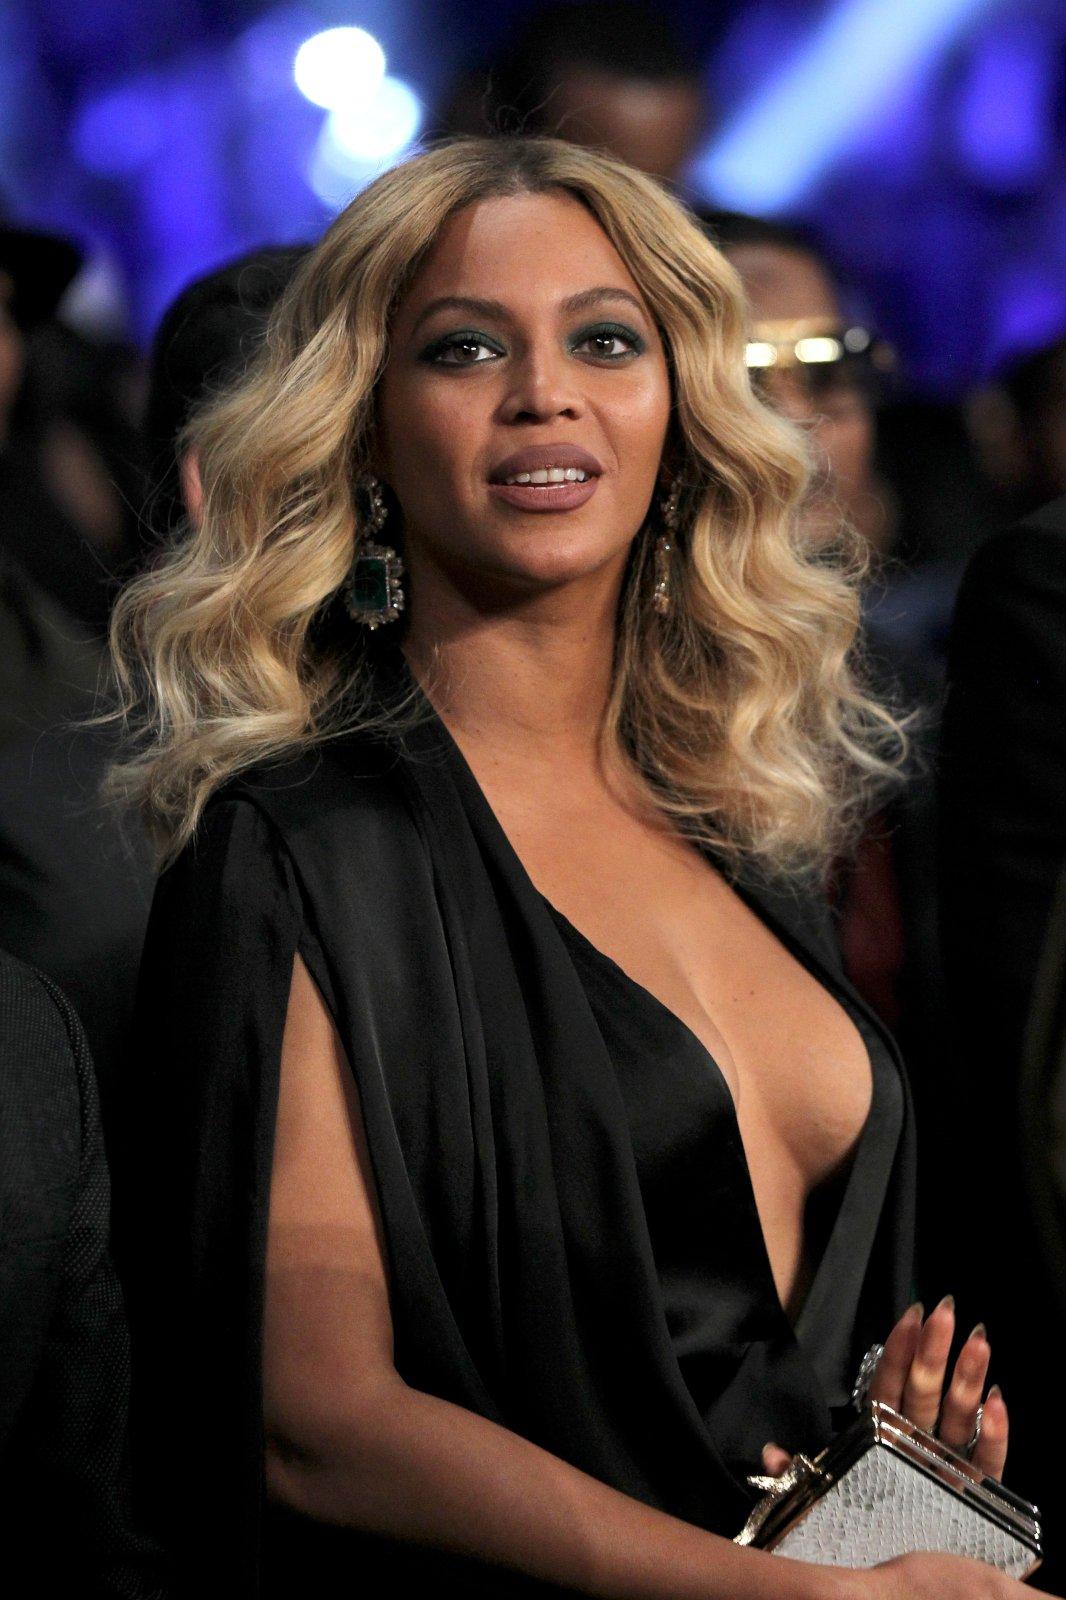 Beyonce-Braless-11